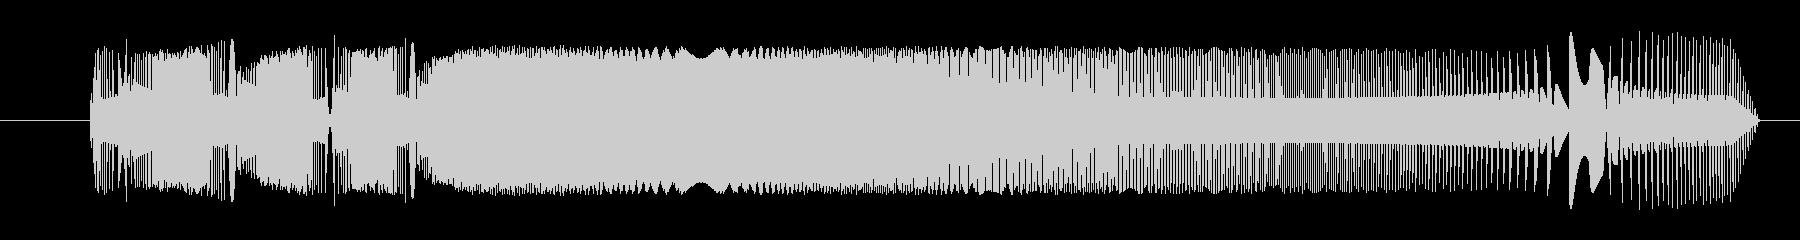 FX 合成信号04の未再生の波形